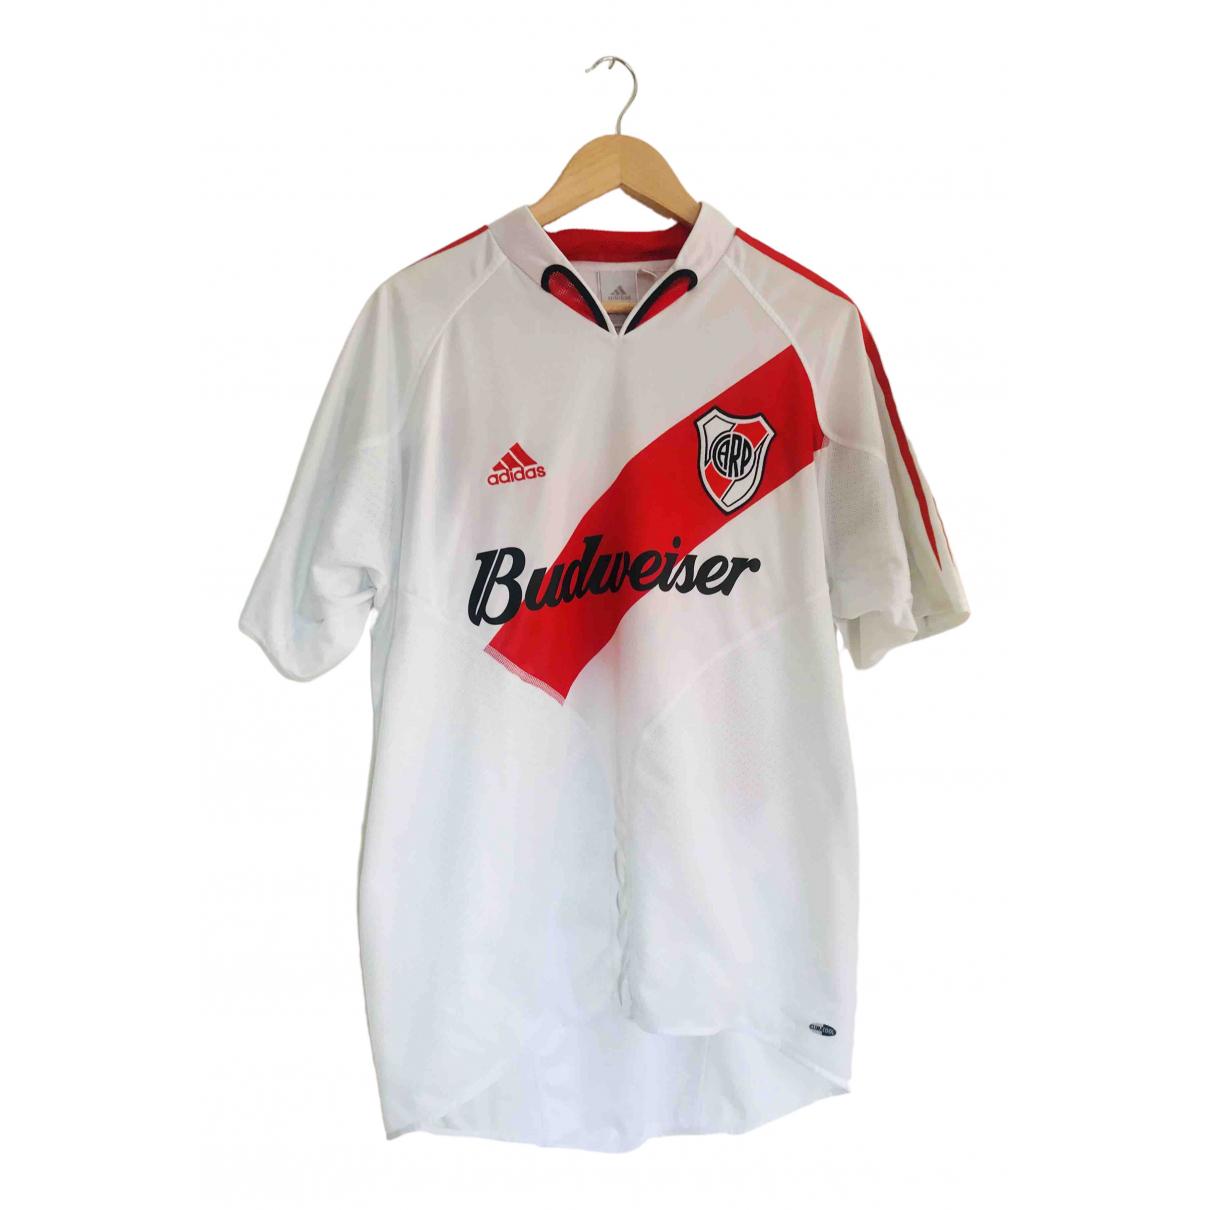 Adidas \N White Shirts for Men L International